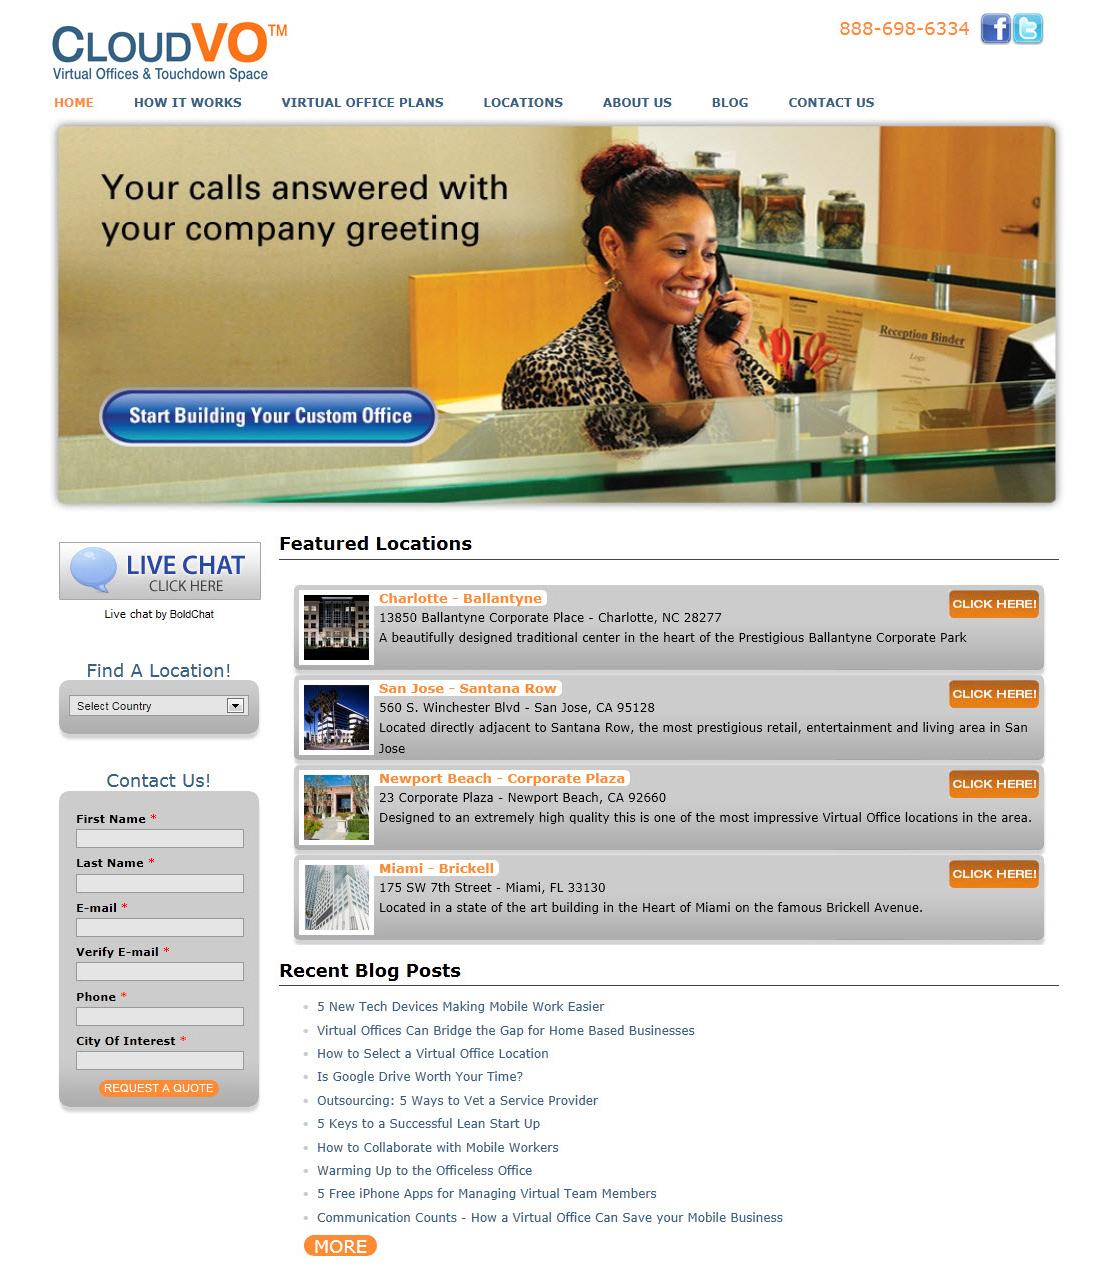 cloudvirtualoffice.com.jpg